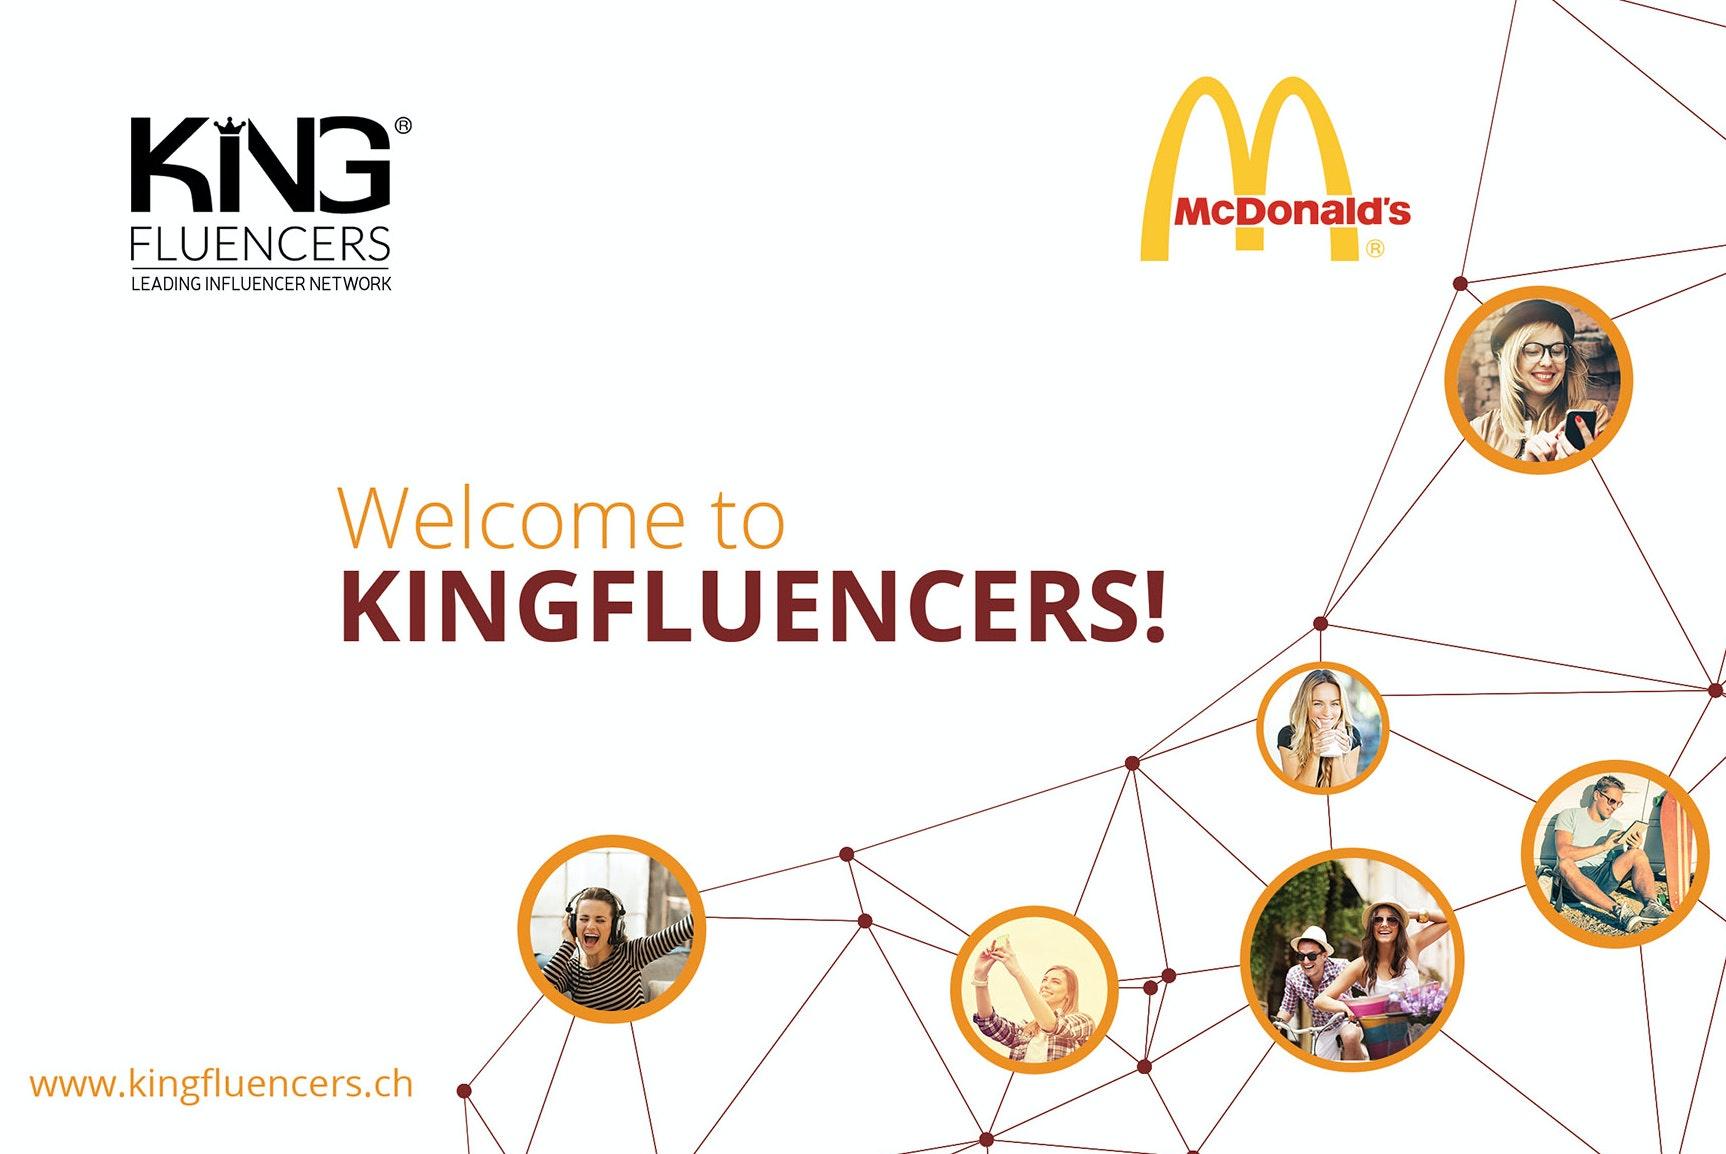 Kingfluencers web page design